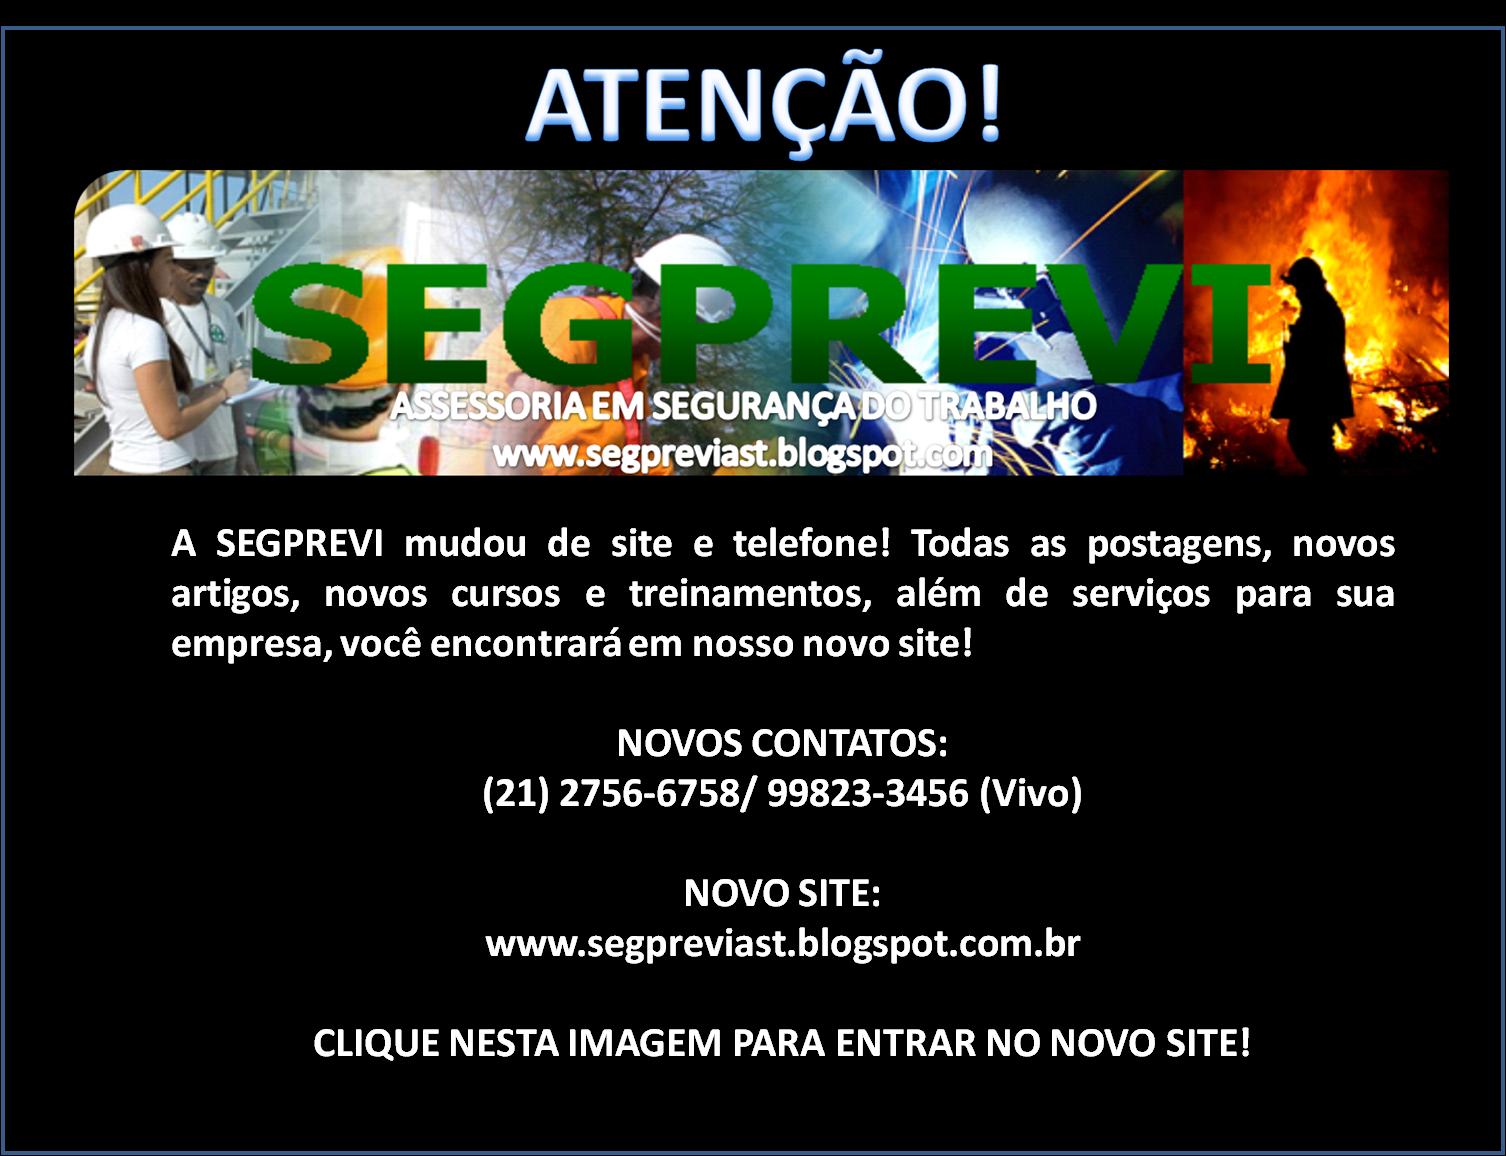 http://www.segpreviast.blogspot.com.br